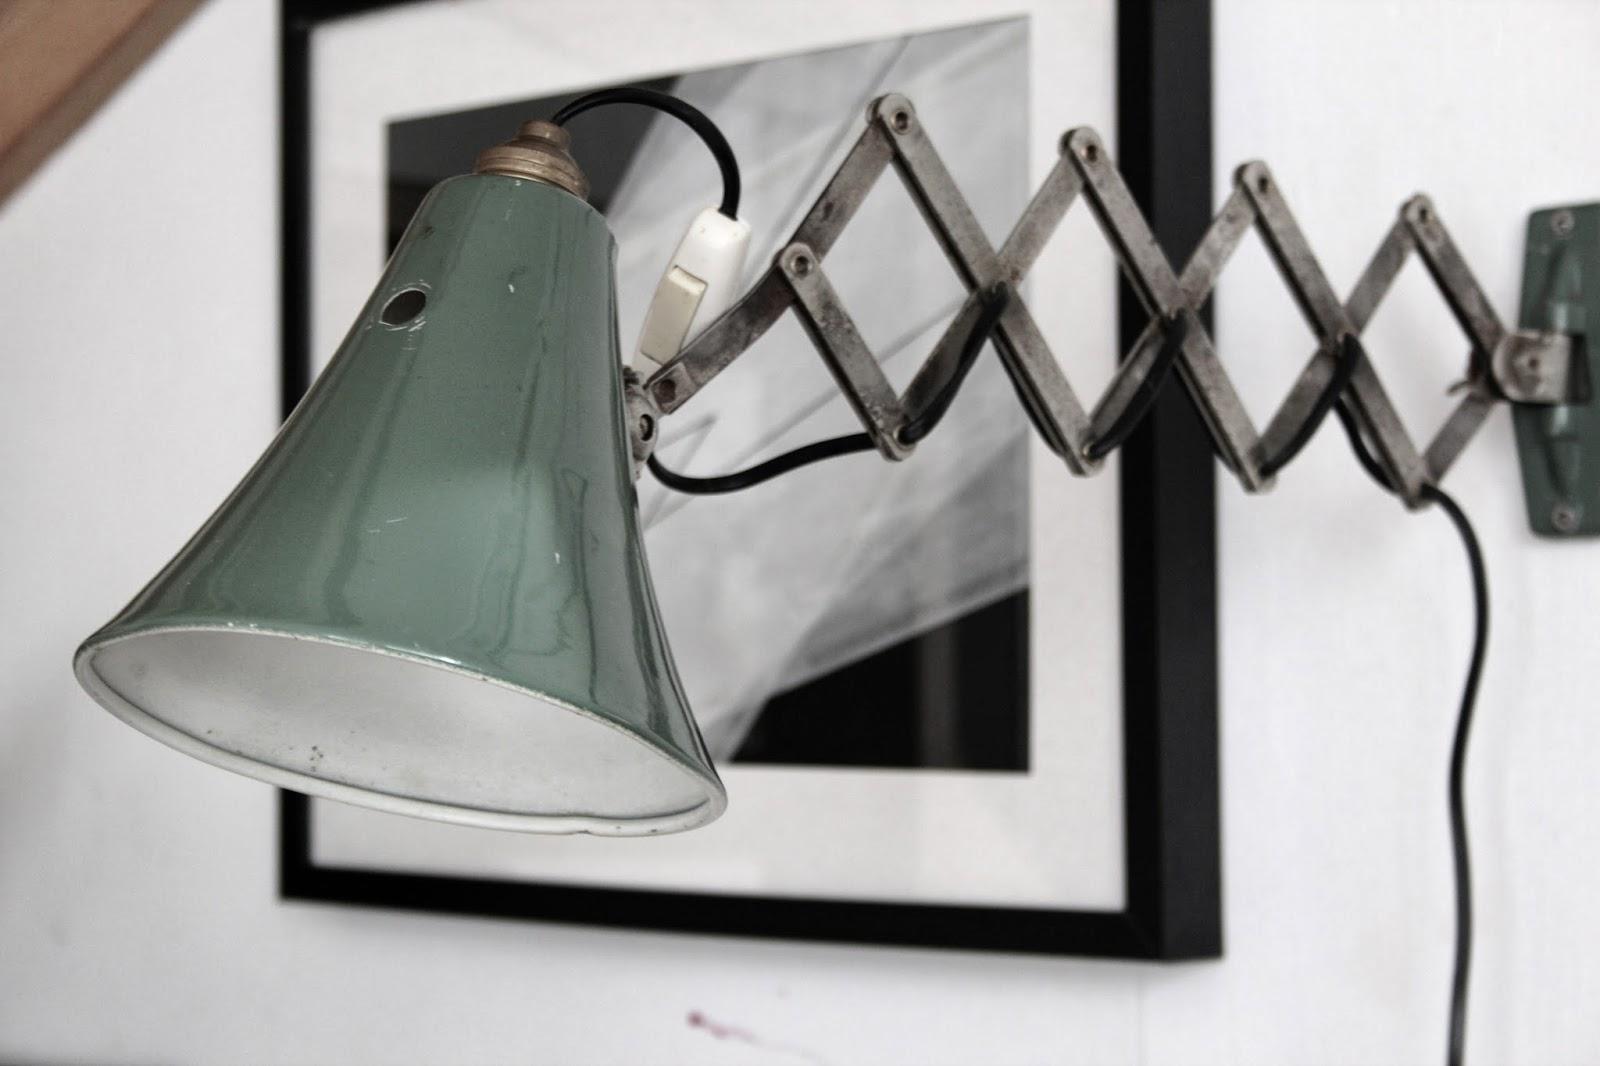 Wall Mounted Scissor Lamp : my scandinavian home: My new vintage/industrial scissor wall lamp